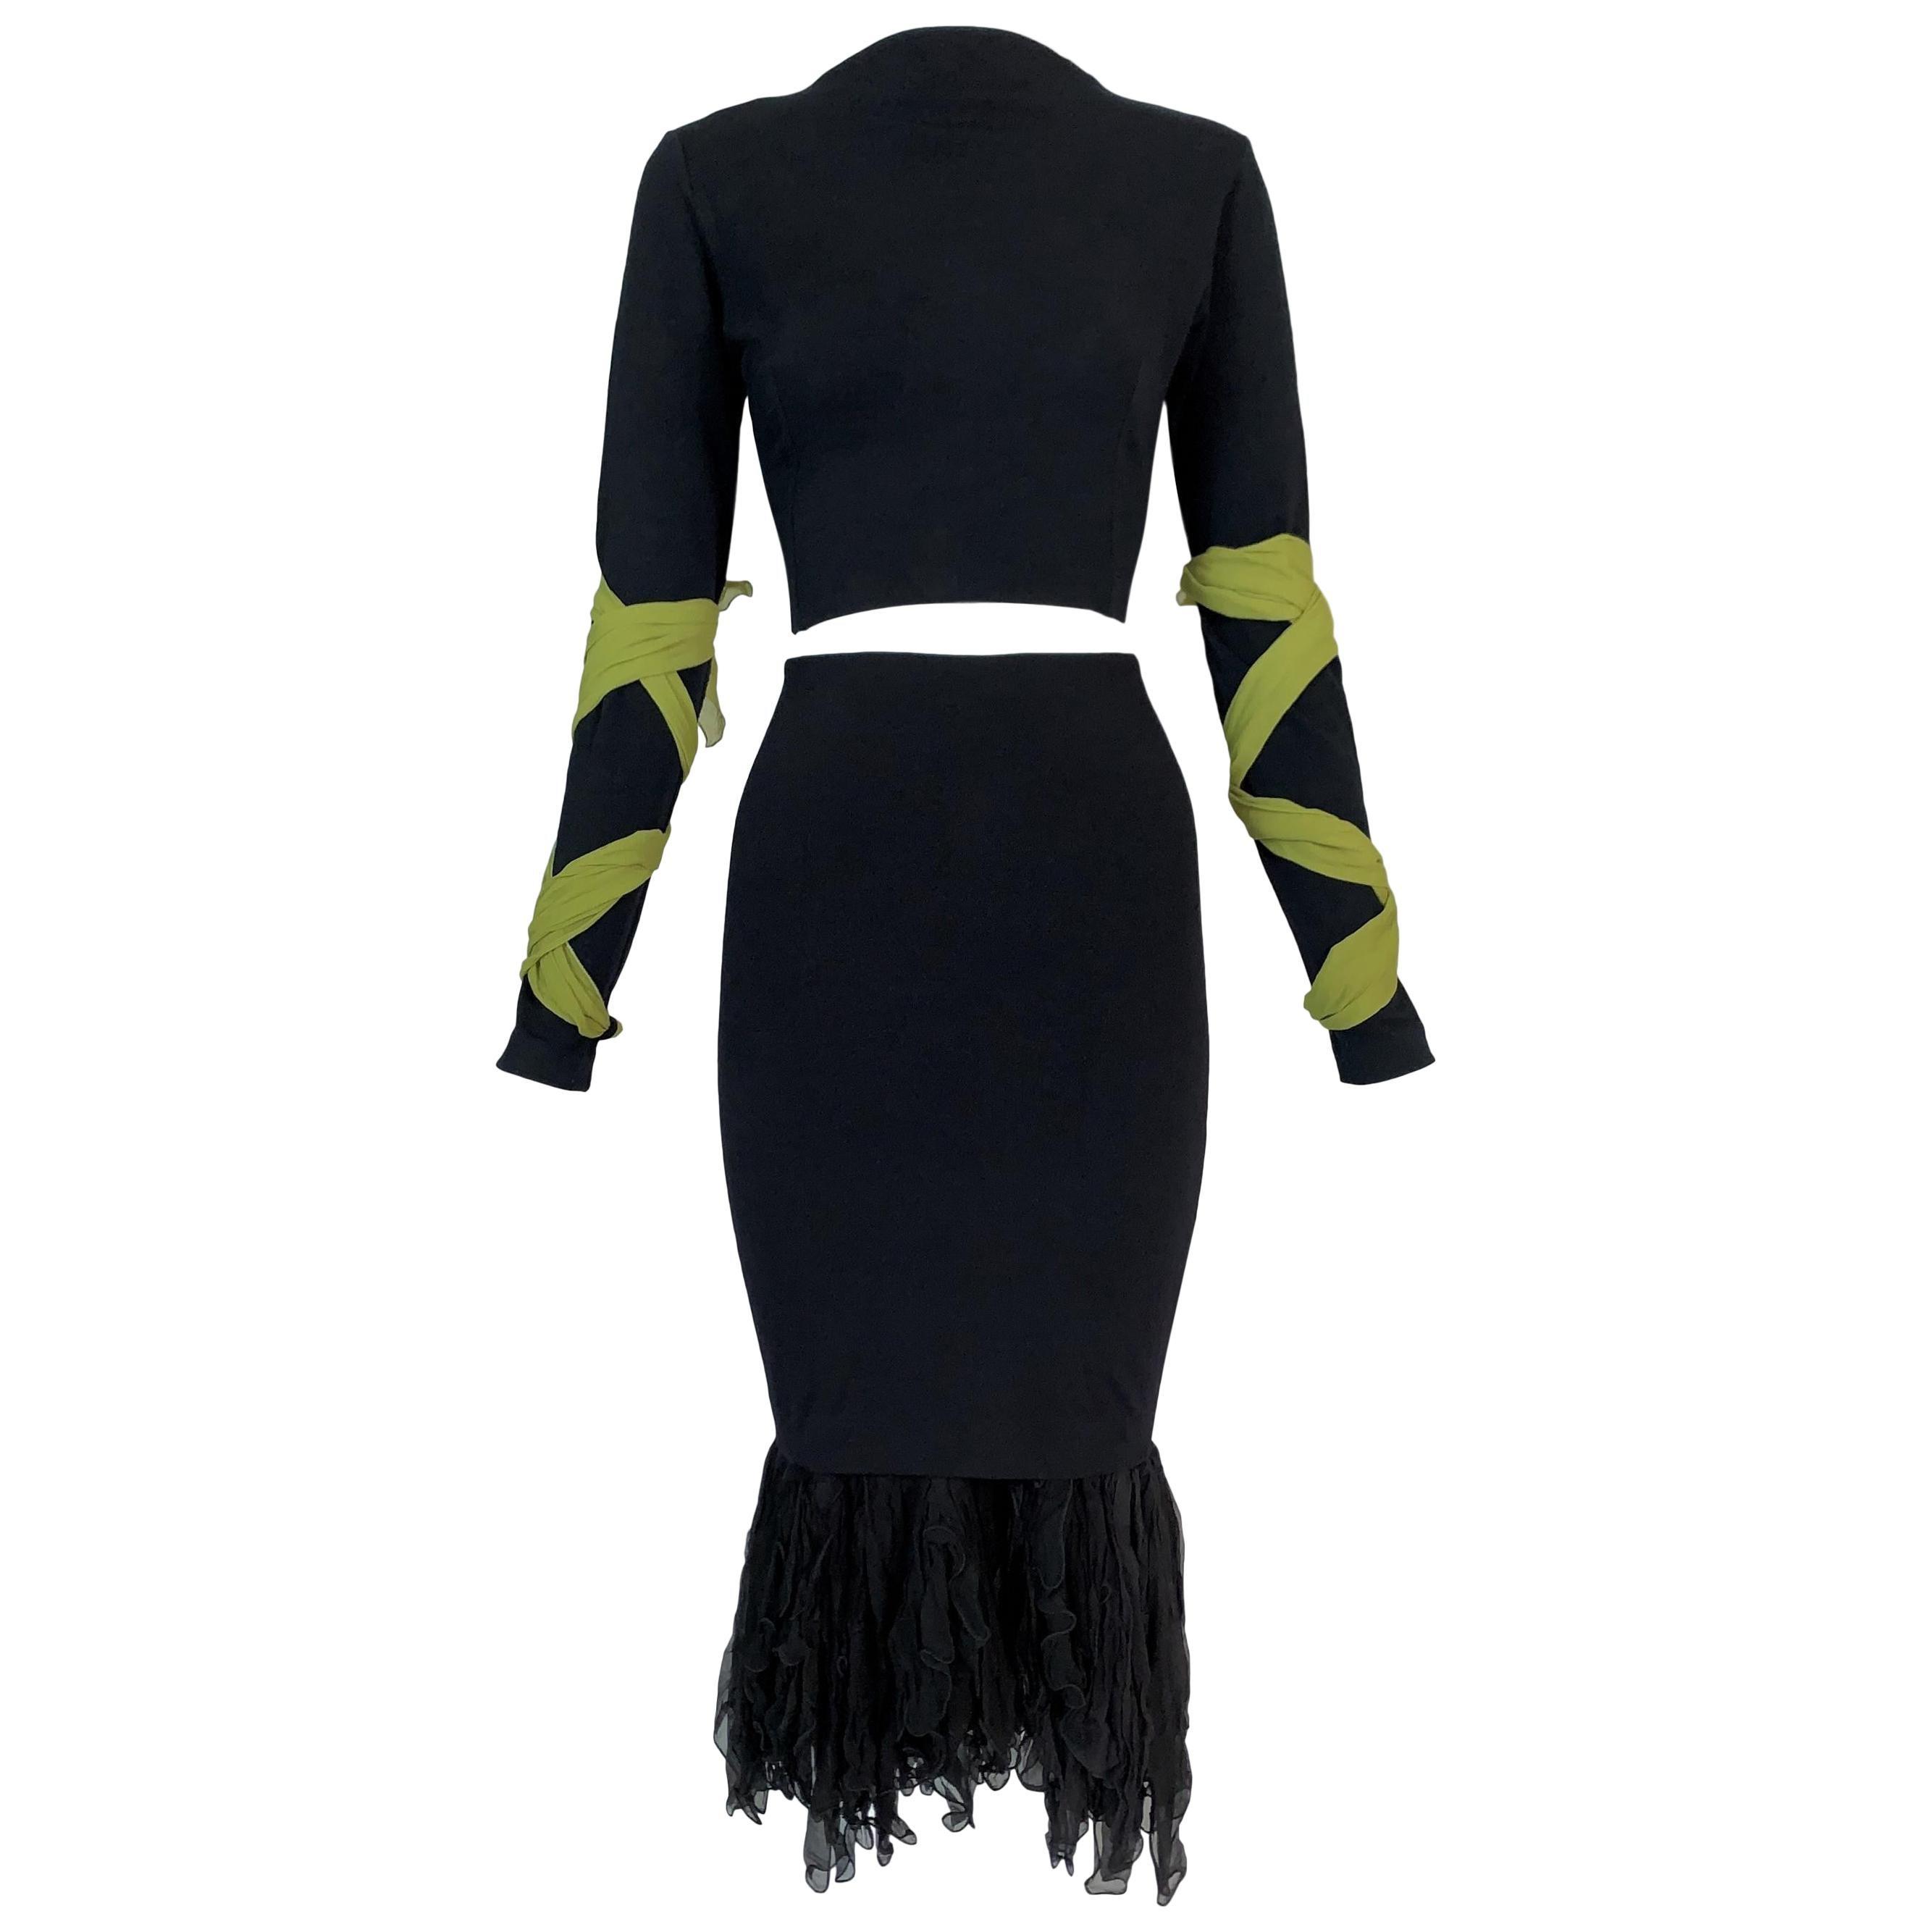 F/W 1991 Dolce & Gabbana Black Crop Top w Green Ties & High Waist Skirt